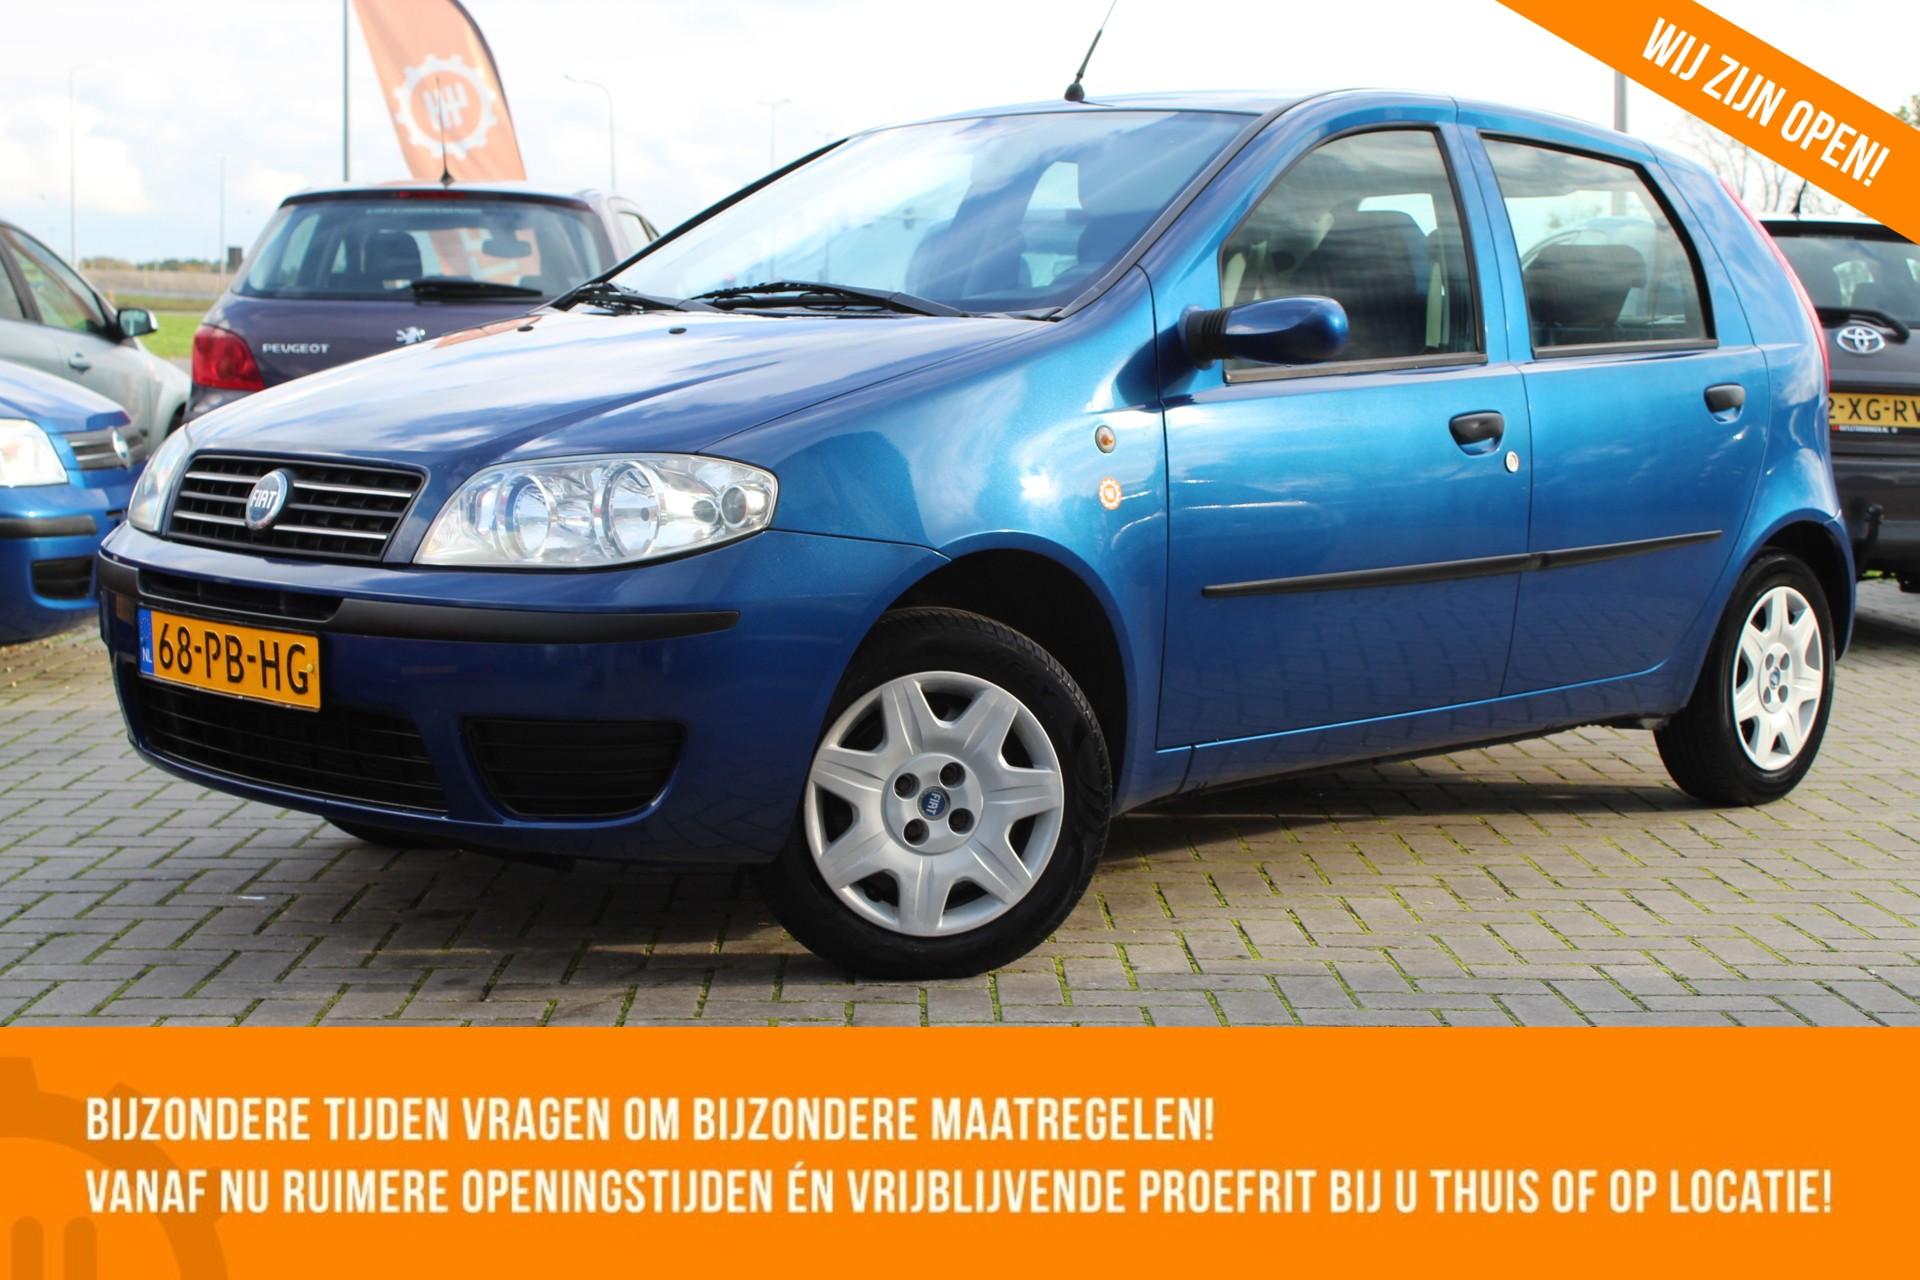 Caroutlet Groningen - Fiat Punto 1.2 Active | 2004 | AIRCO | 5 DEURS |